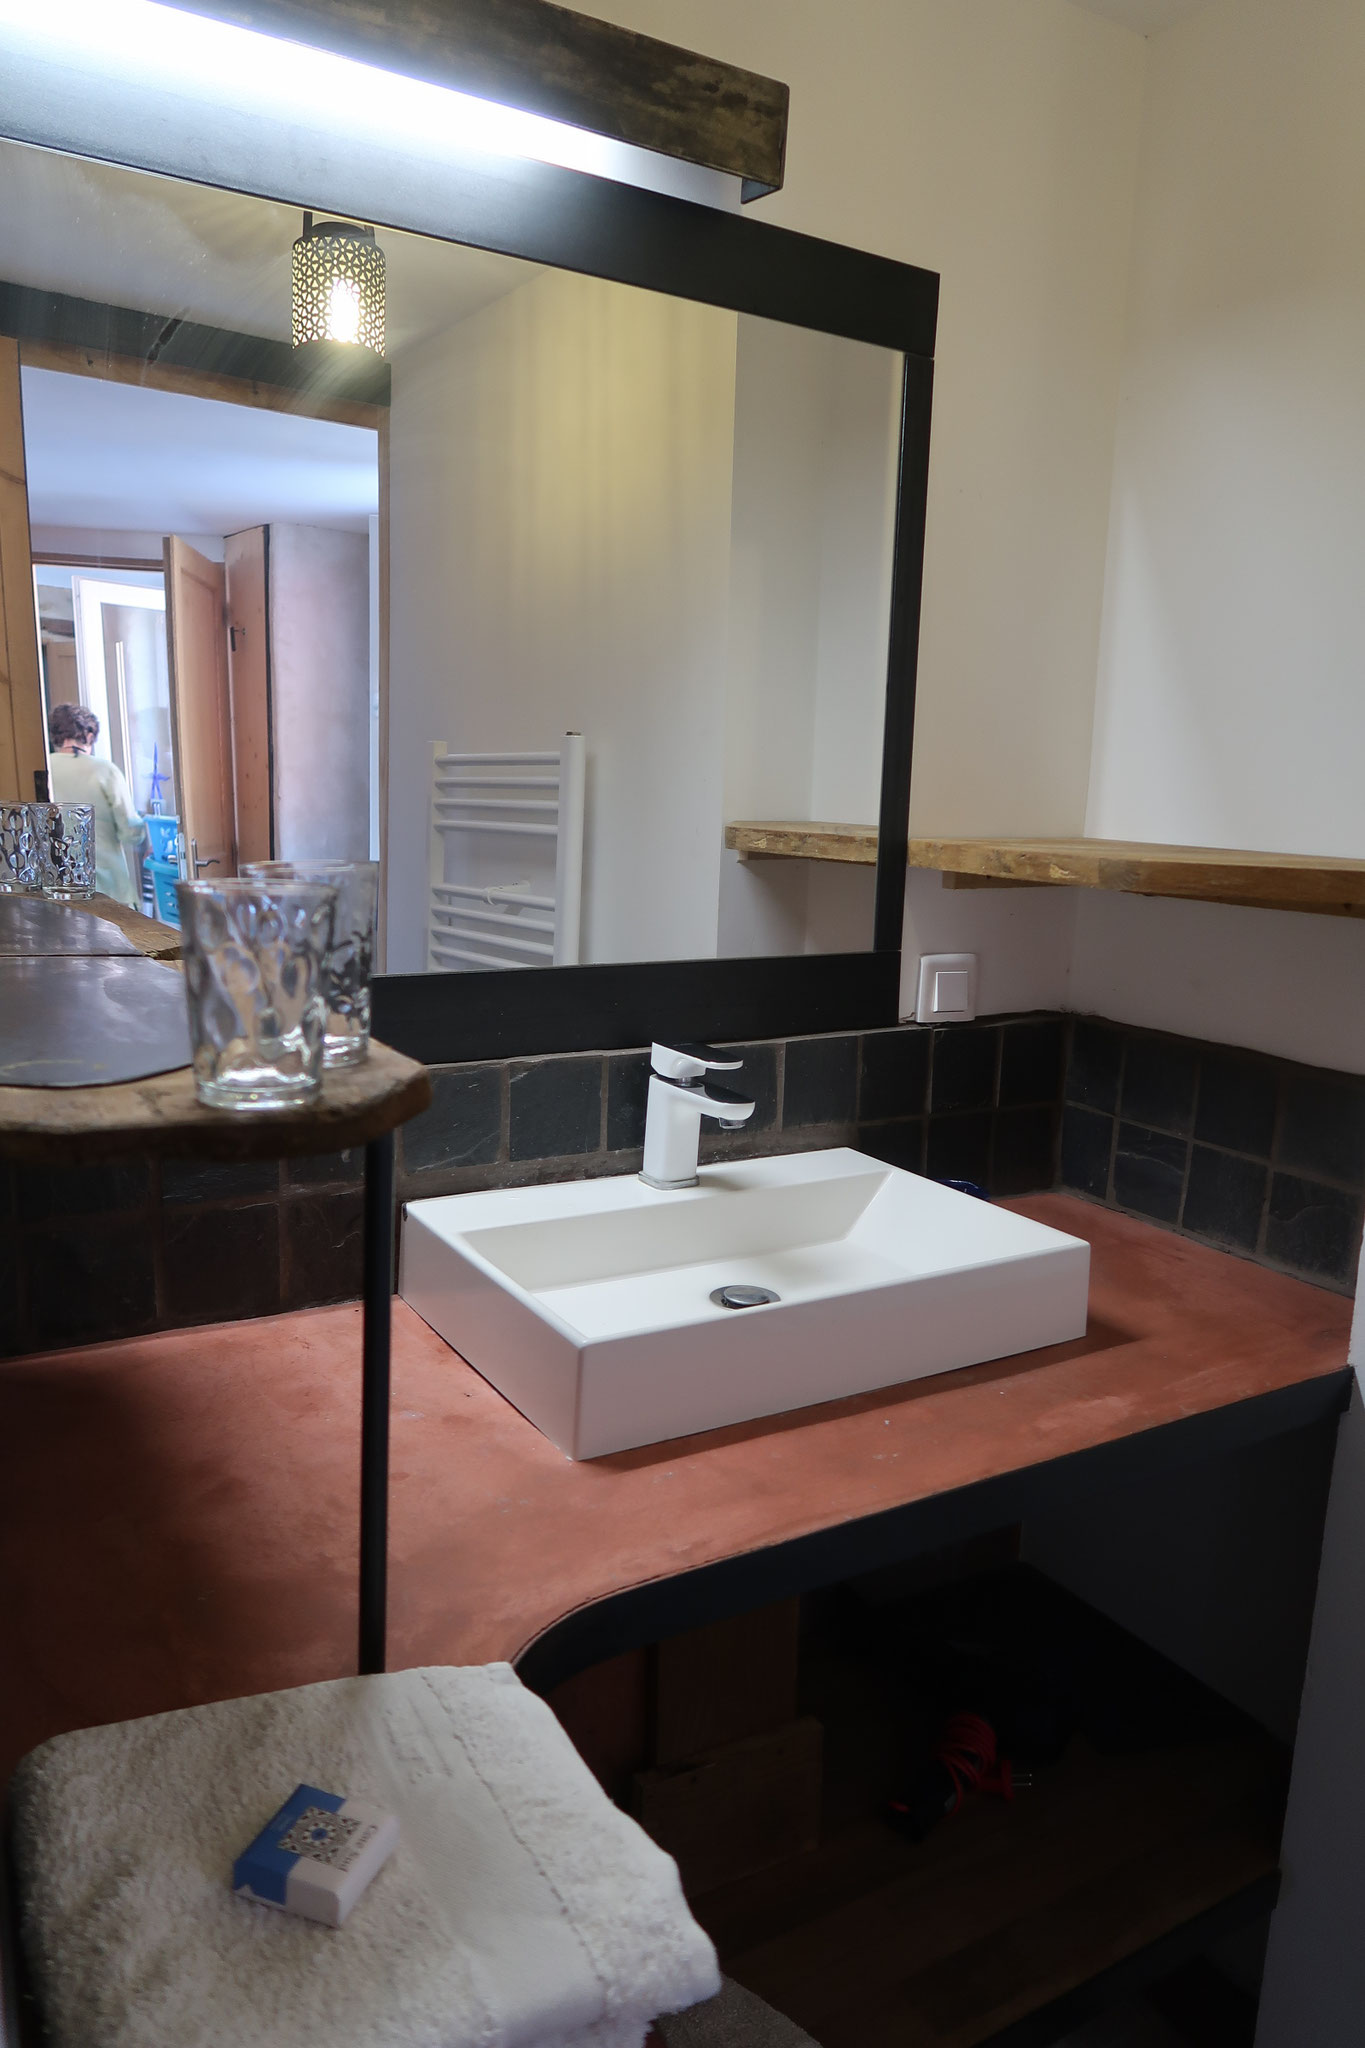 lavabo basquiat room